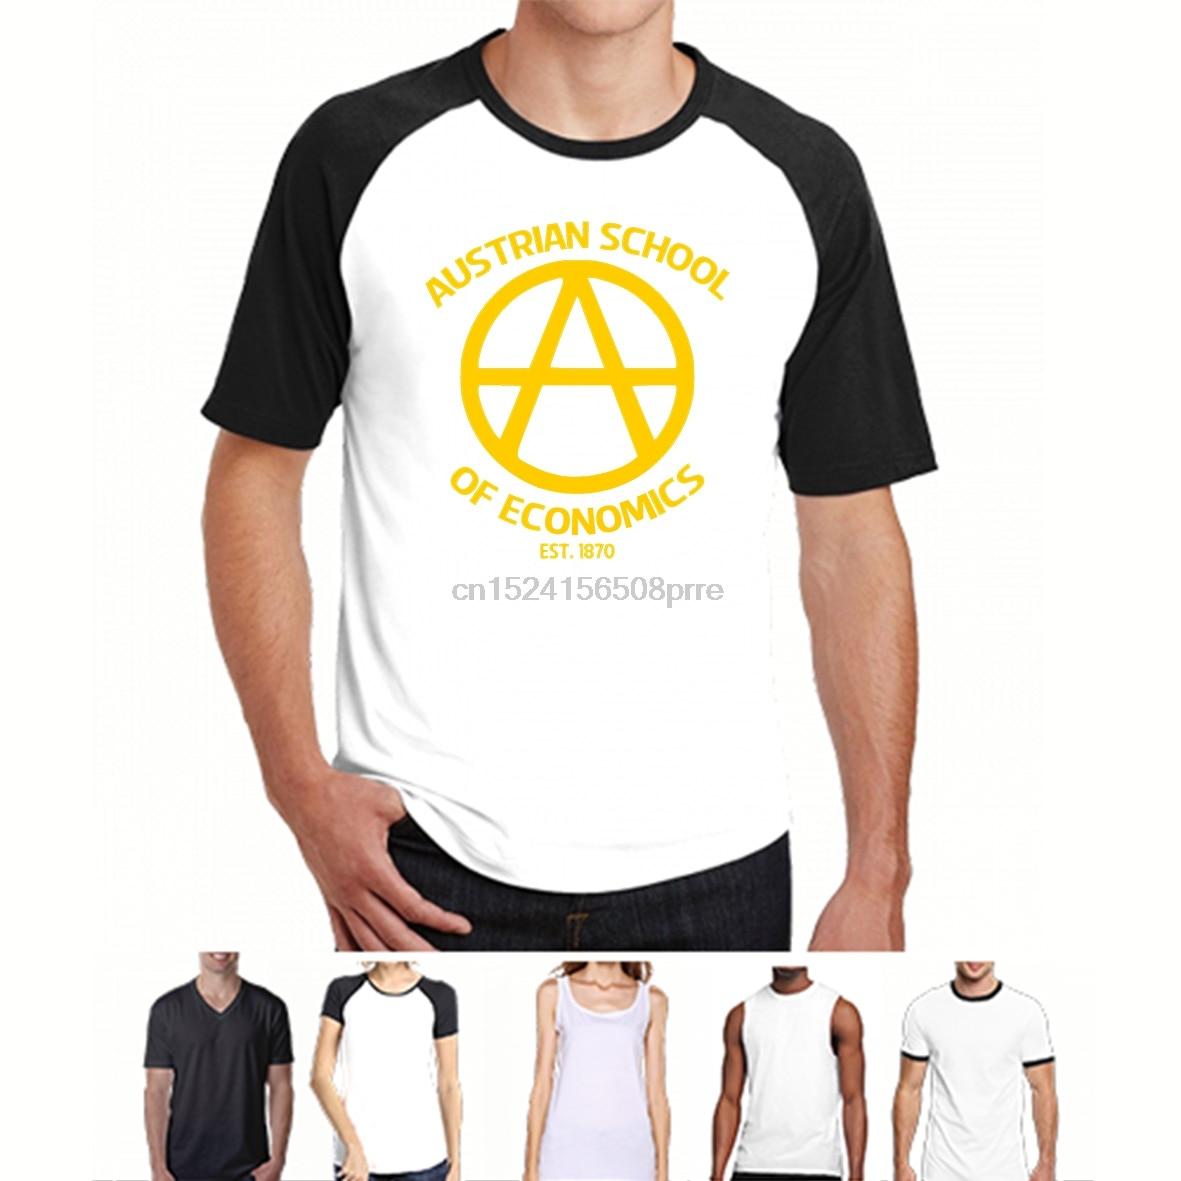 b066181ba Detail Feedback Questions about Fashion Cool Men T shirt Women Funny tshirt  Austrian School Economics Capitalism Libertarian Customized Printed T Shirt  on ...